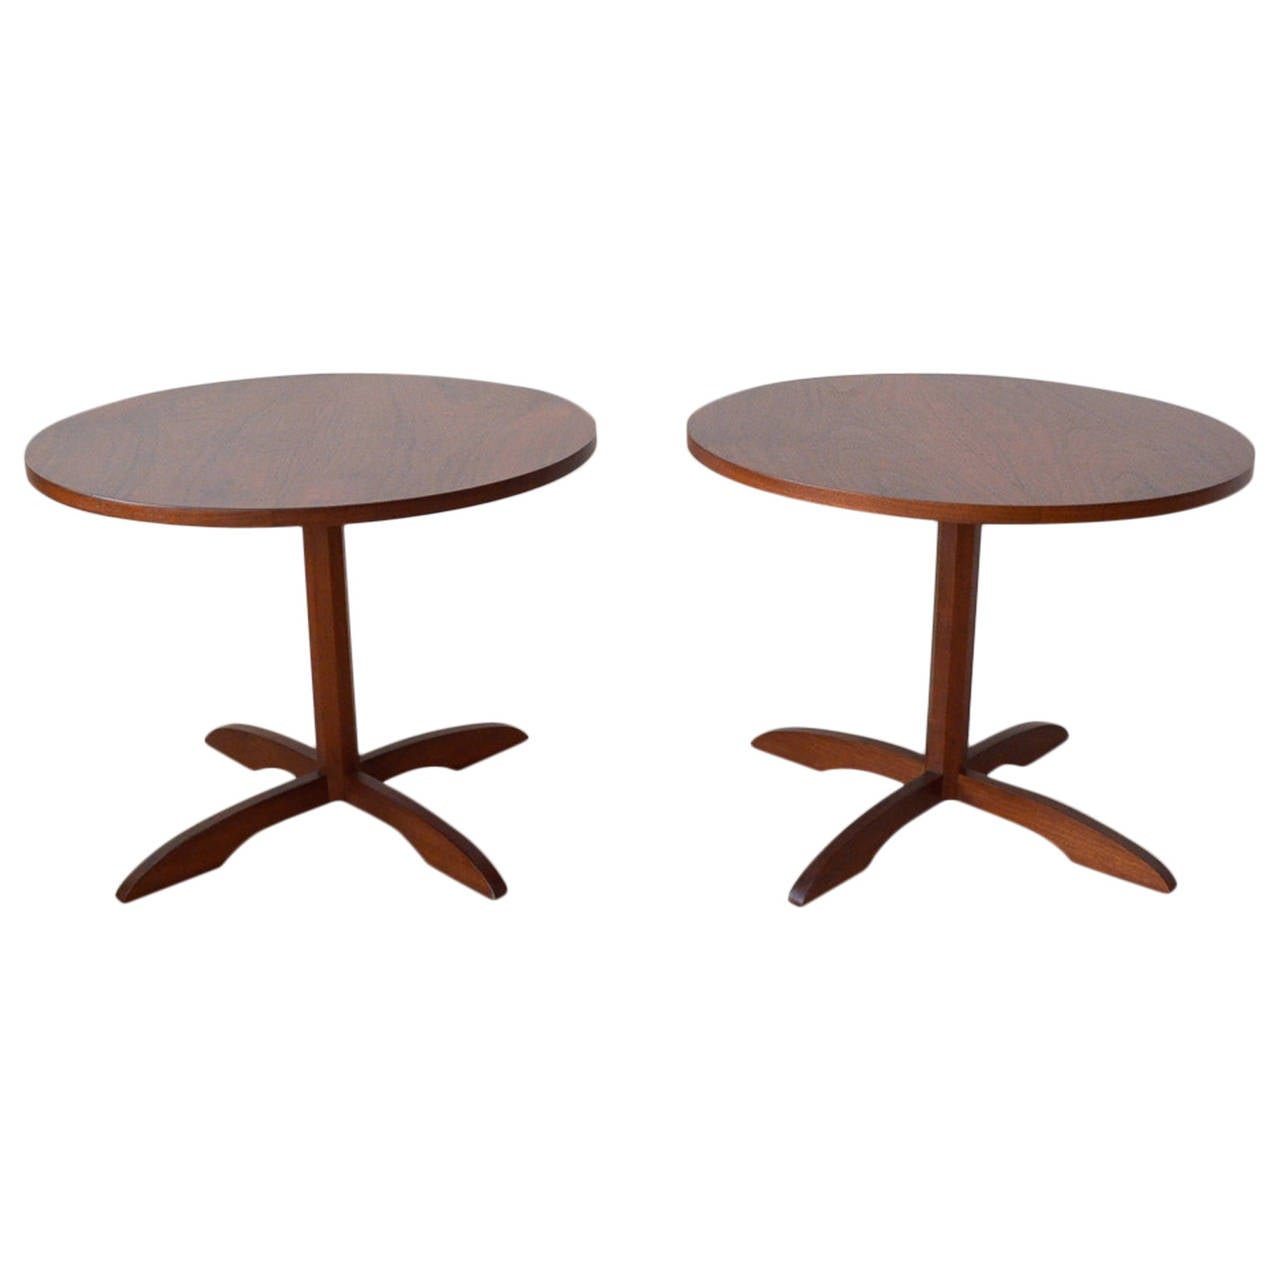 Pair of Walnut Pedestal Base Side Tables